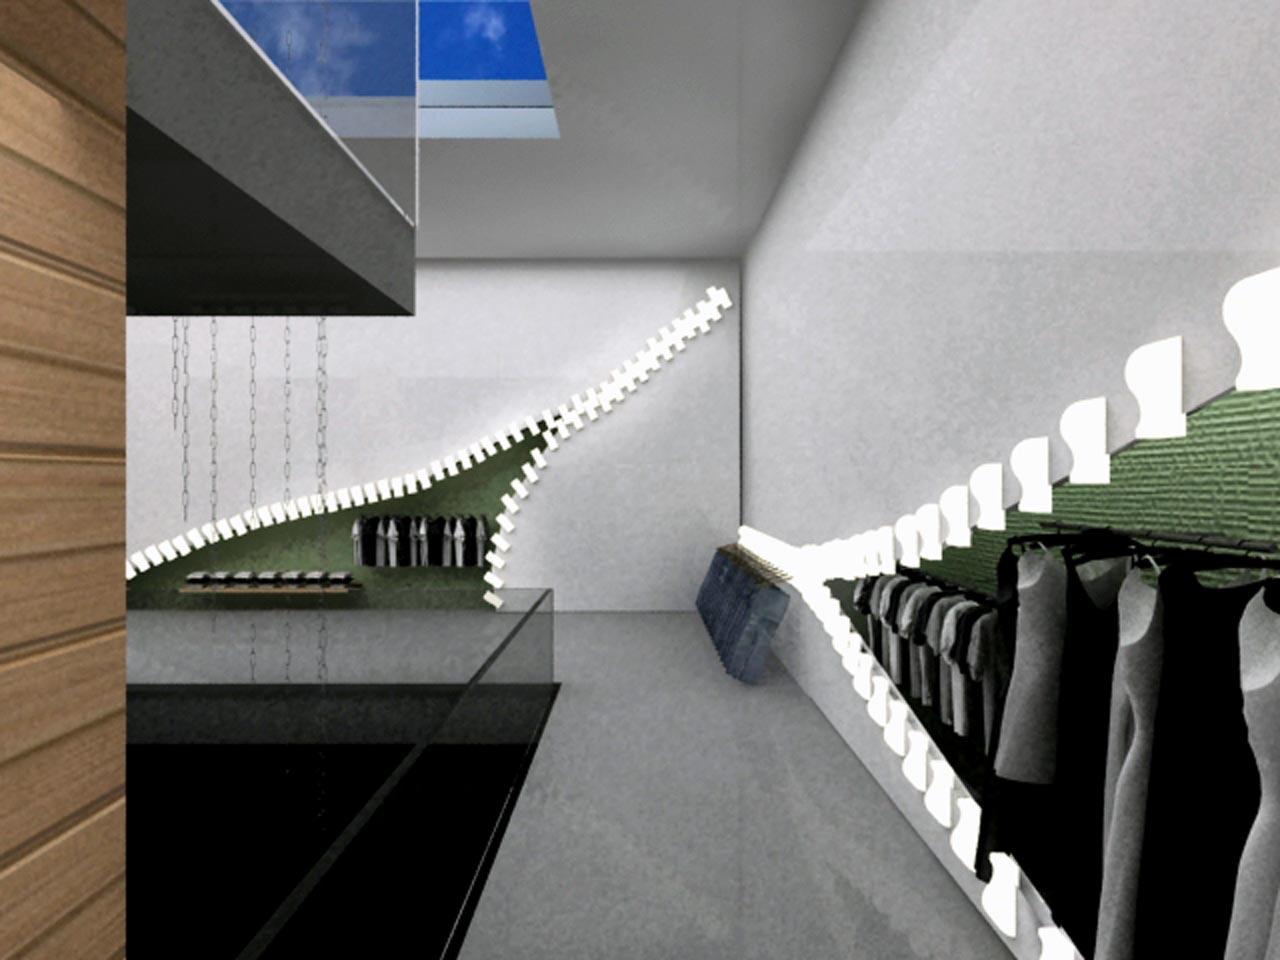 françois girbaud showroom course interior design master shop design ...